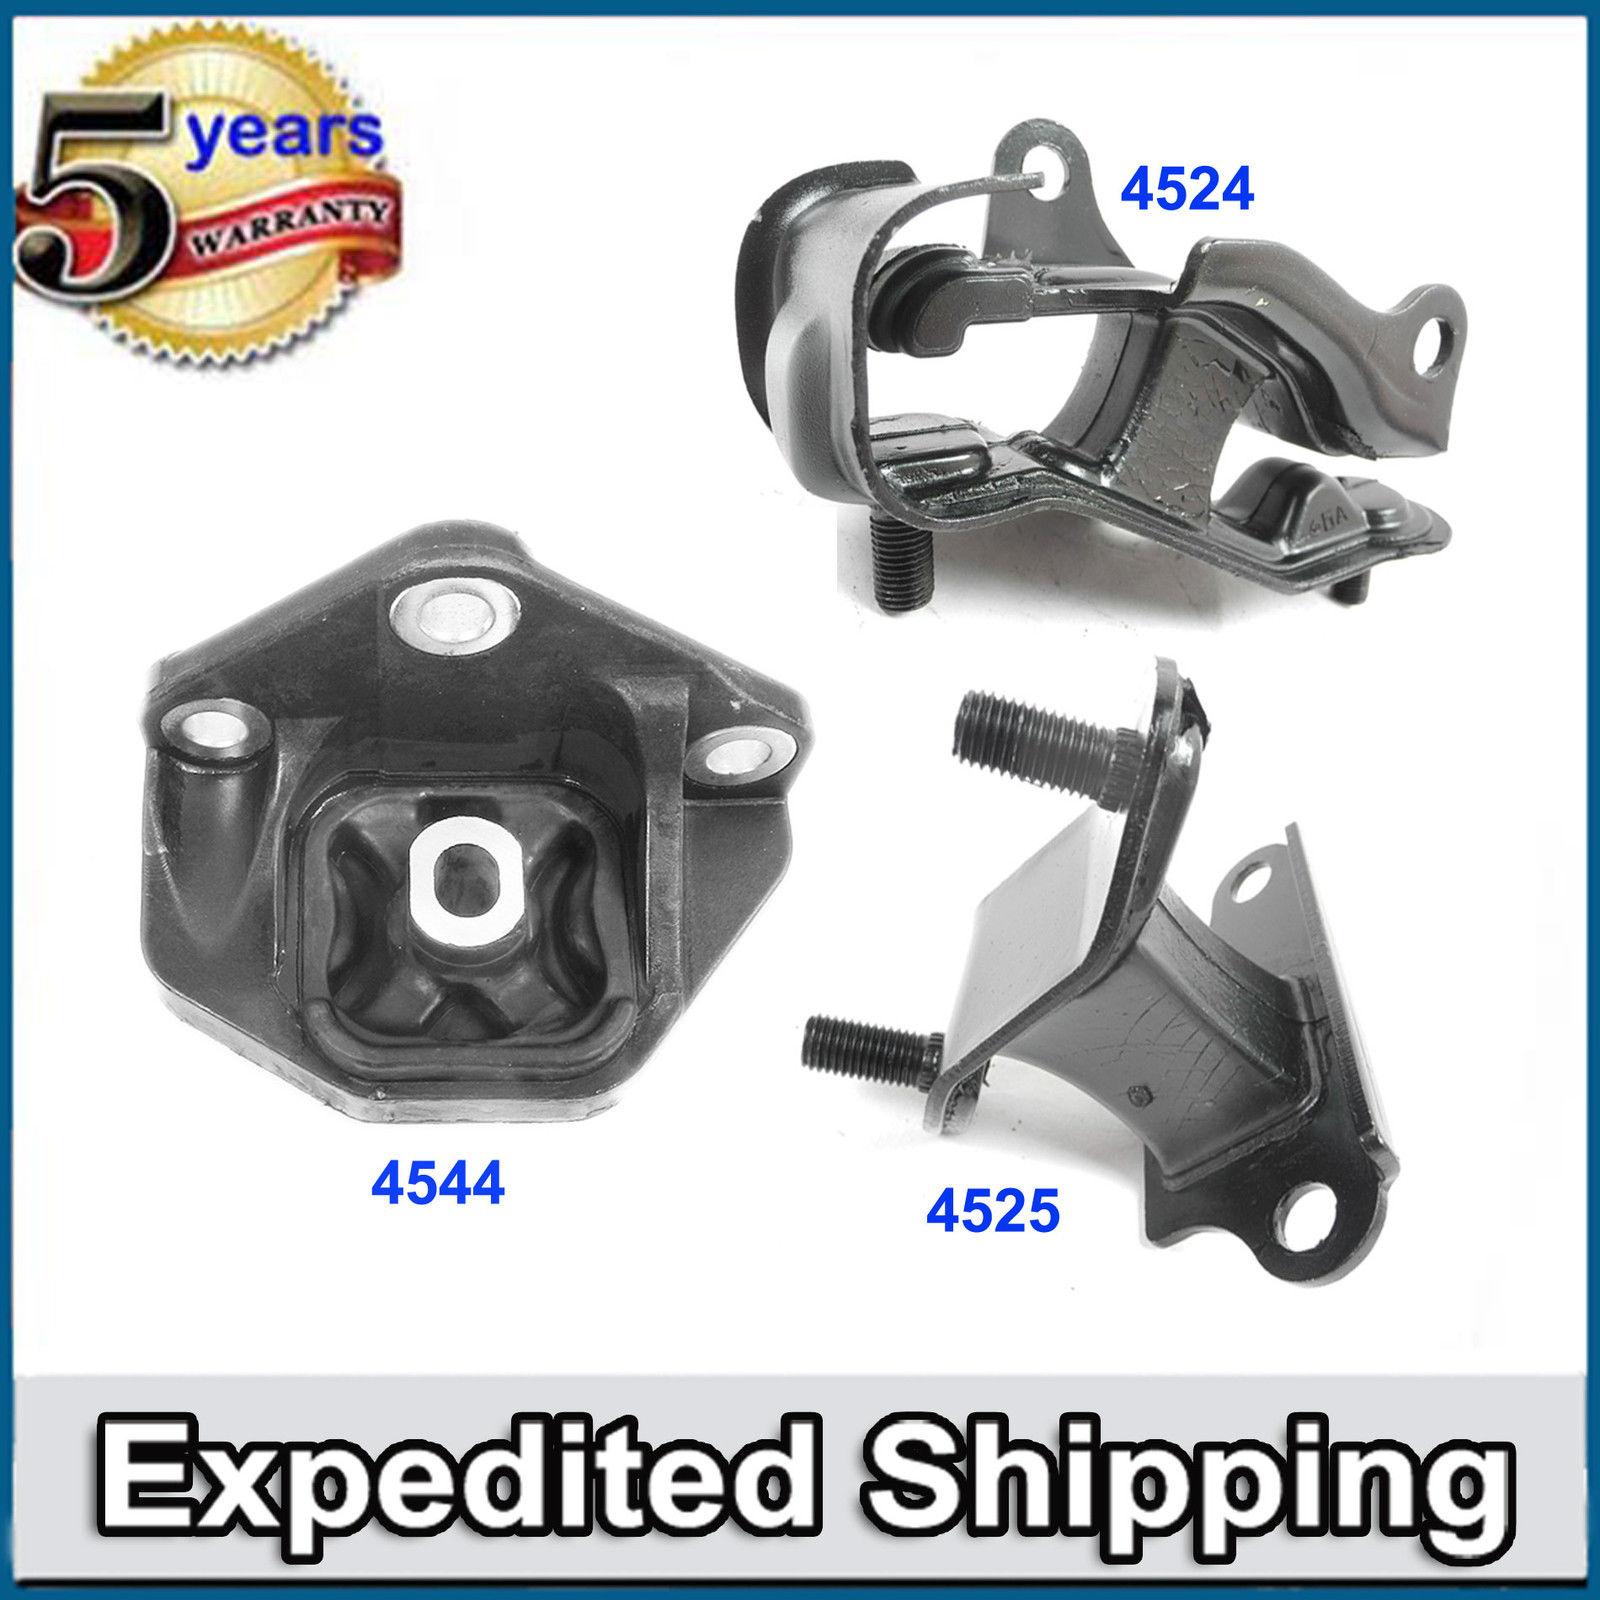 For 03-07 Accord 3.0L V6 SOHC 4525 4544 4524 Transmission Engine Mount Kit